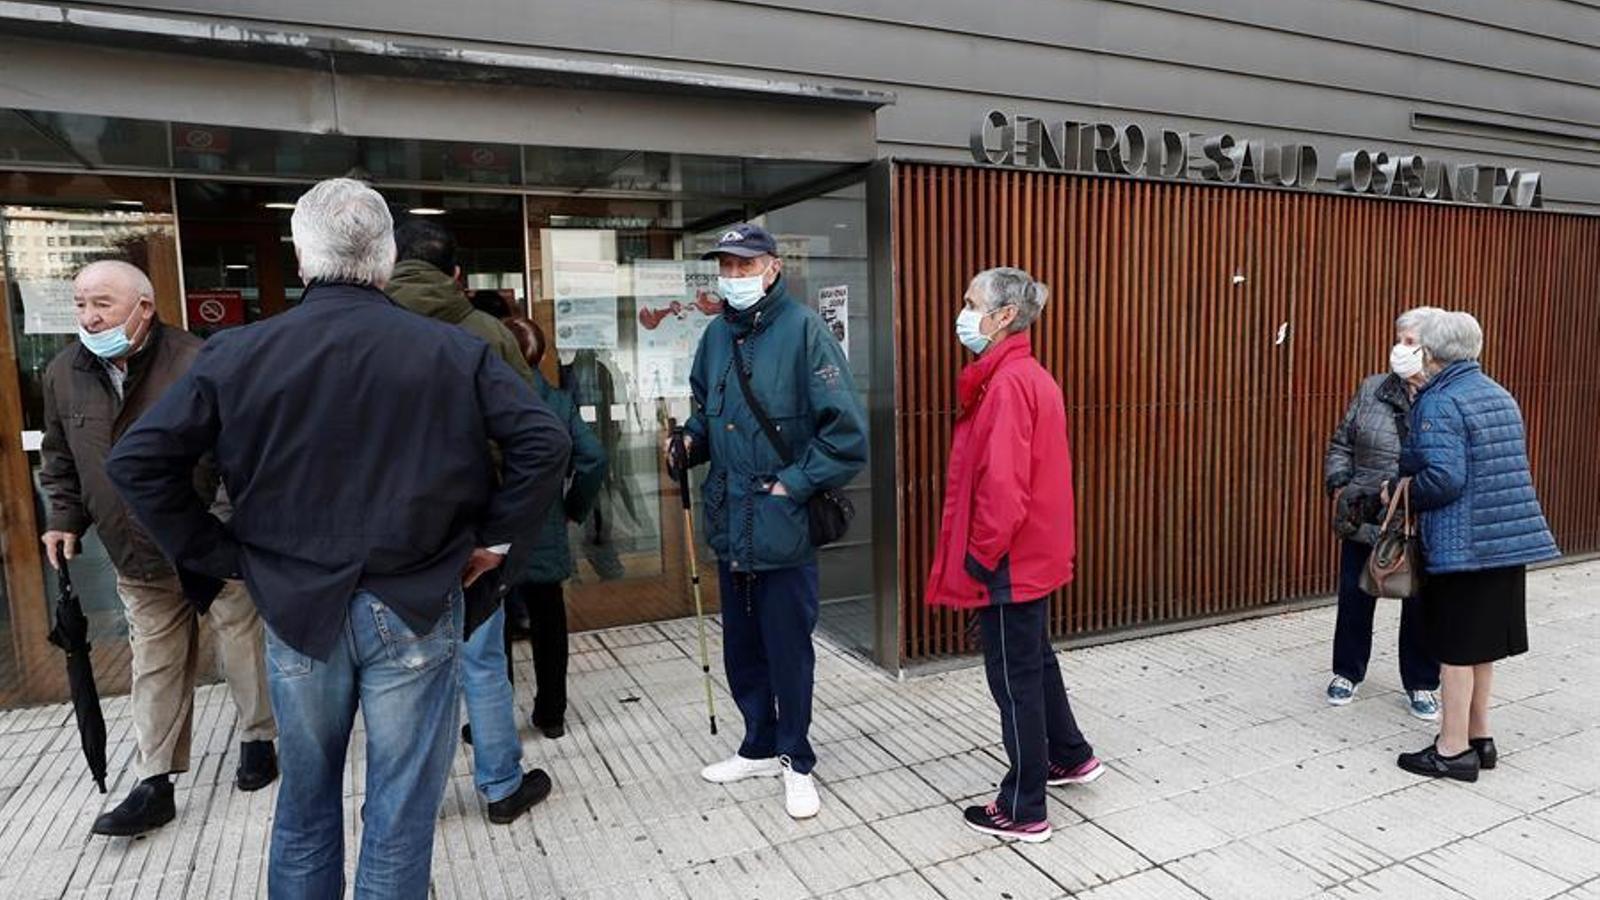 Diverses persones a les portes d'un centre de salut de Pamplona